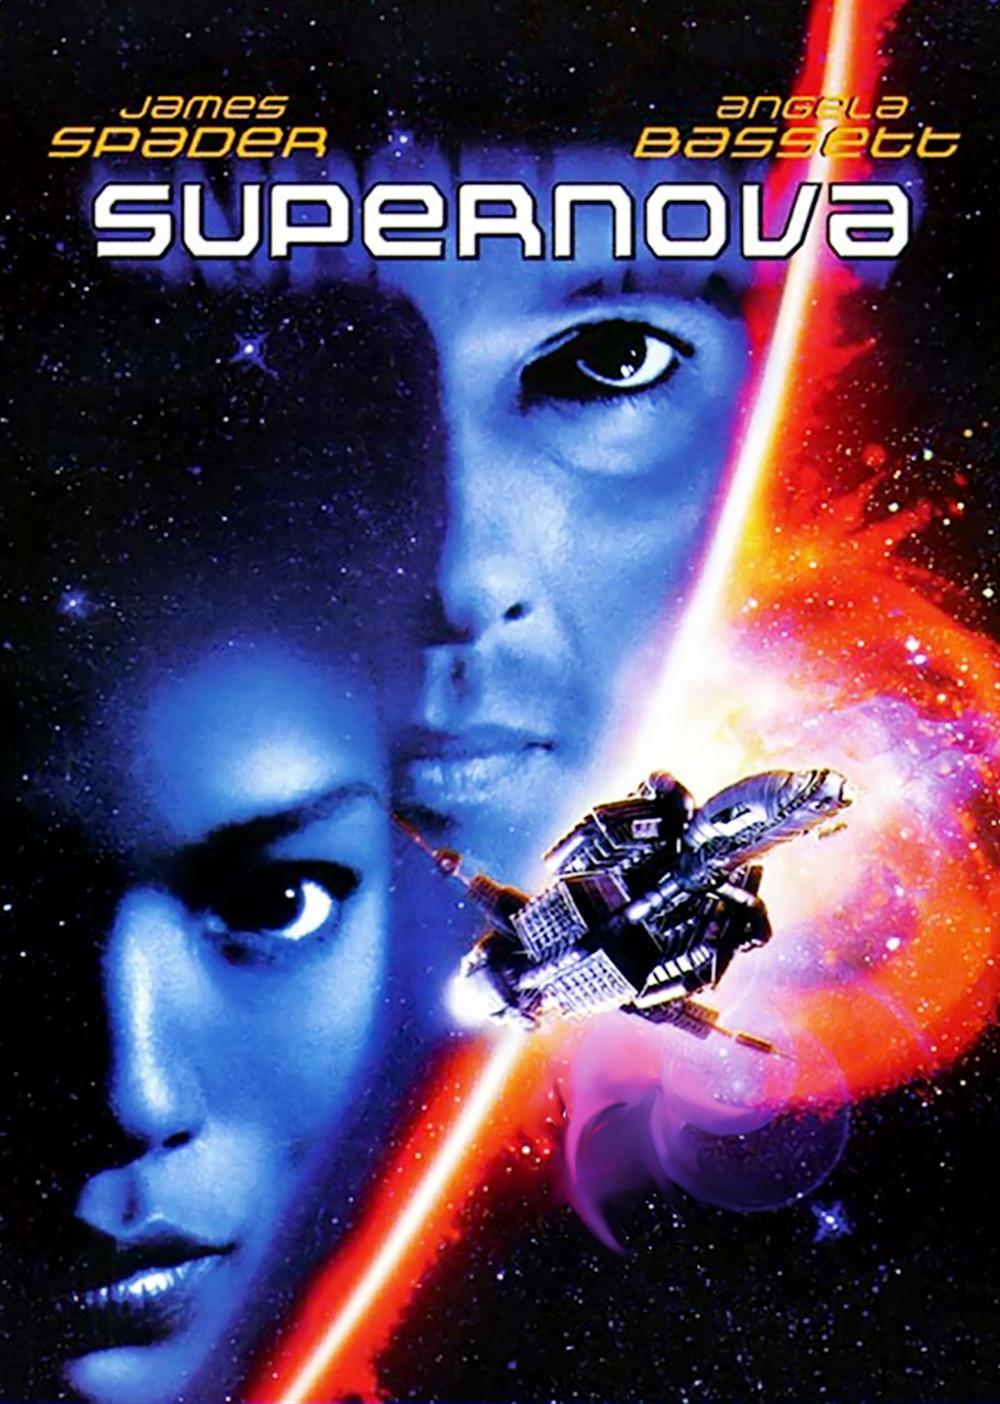 Supernova 2000 Cinemorgue Wiki Fandom Powered By Wikia